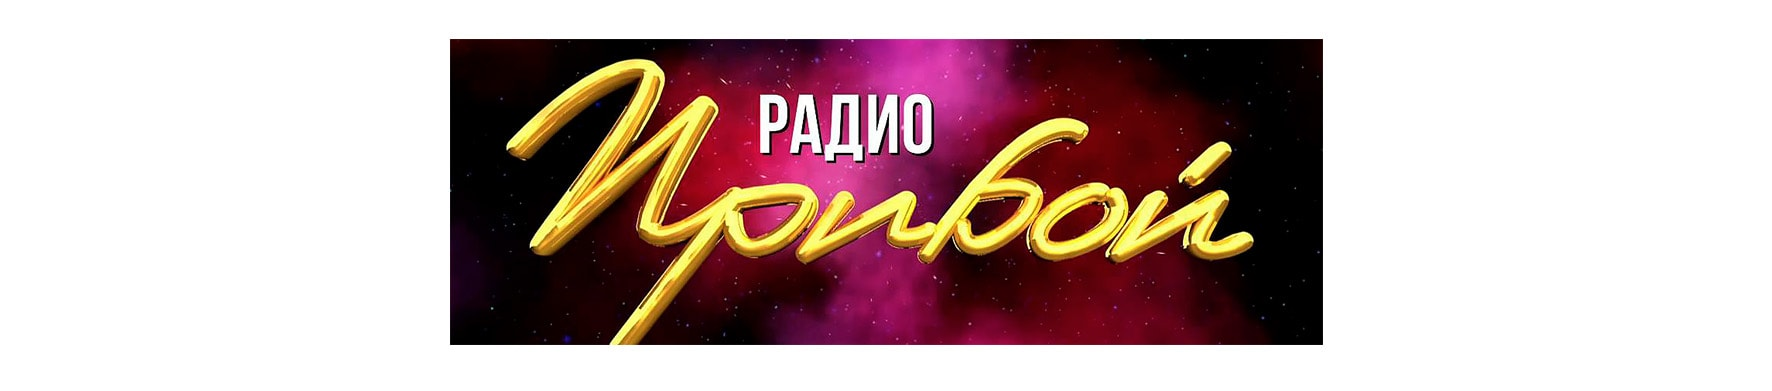 Реклама на радио в Дагестане Прибой